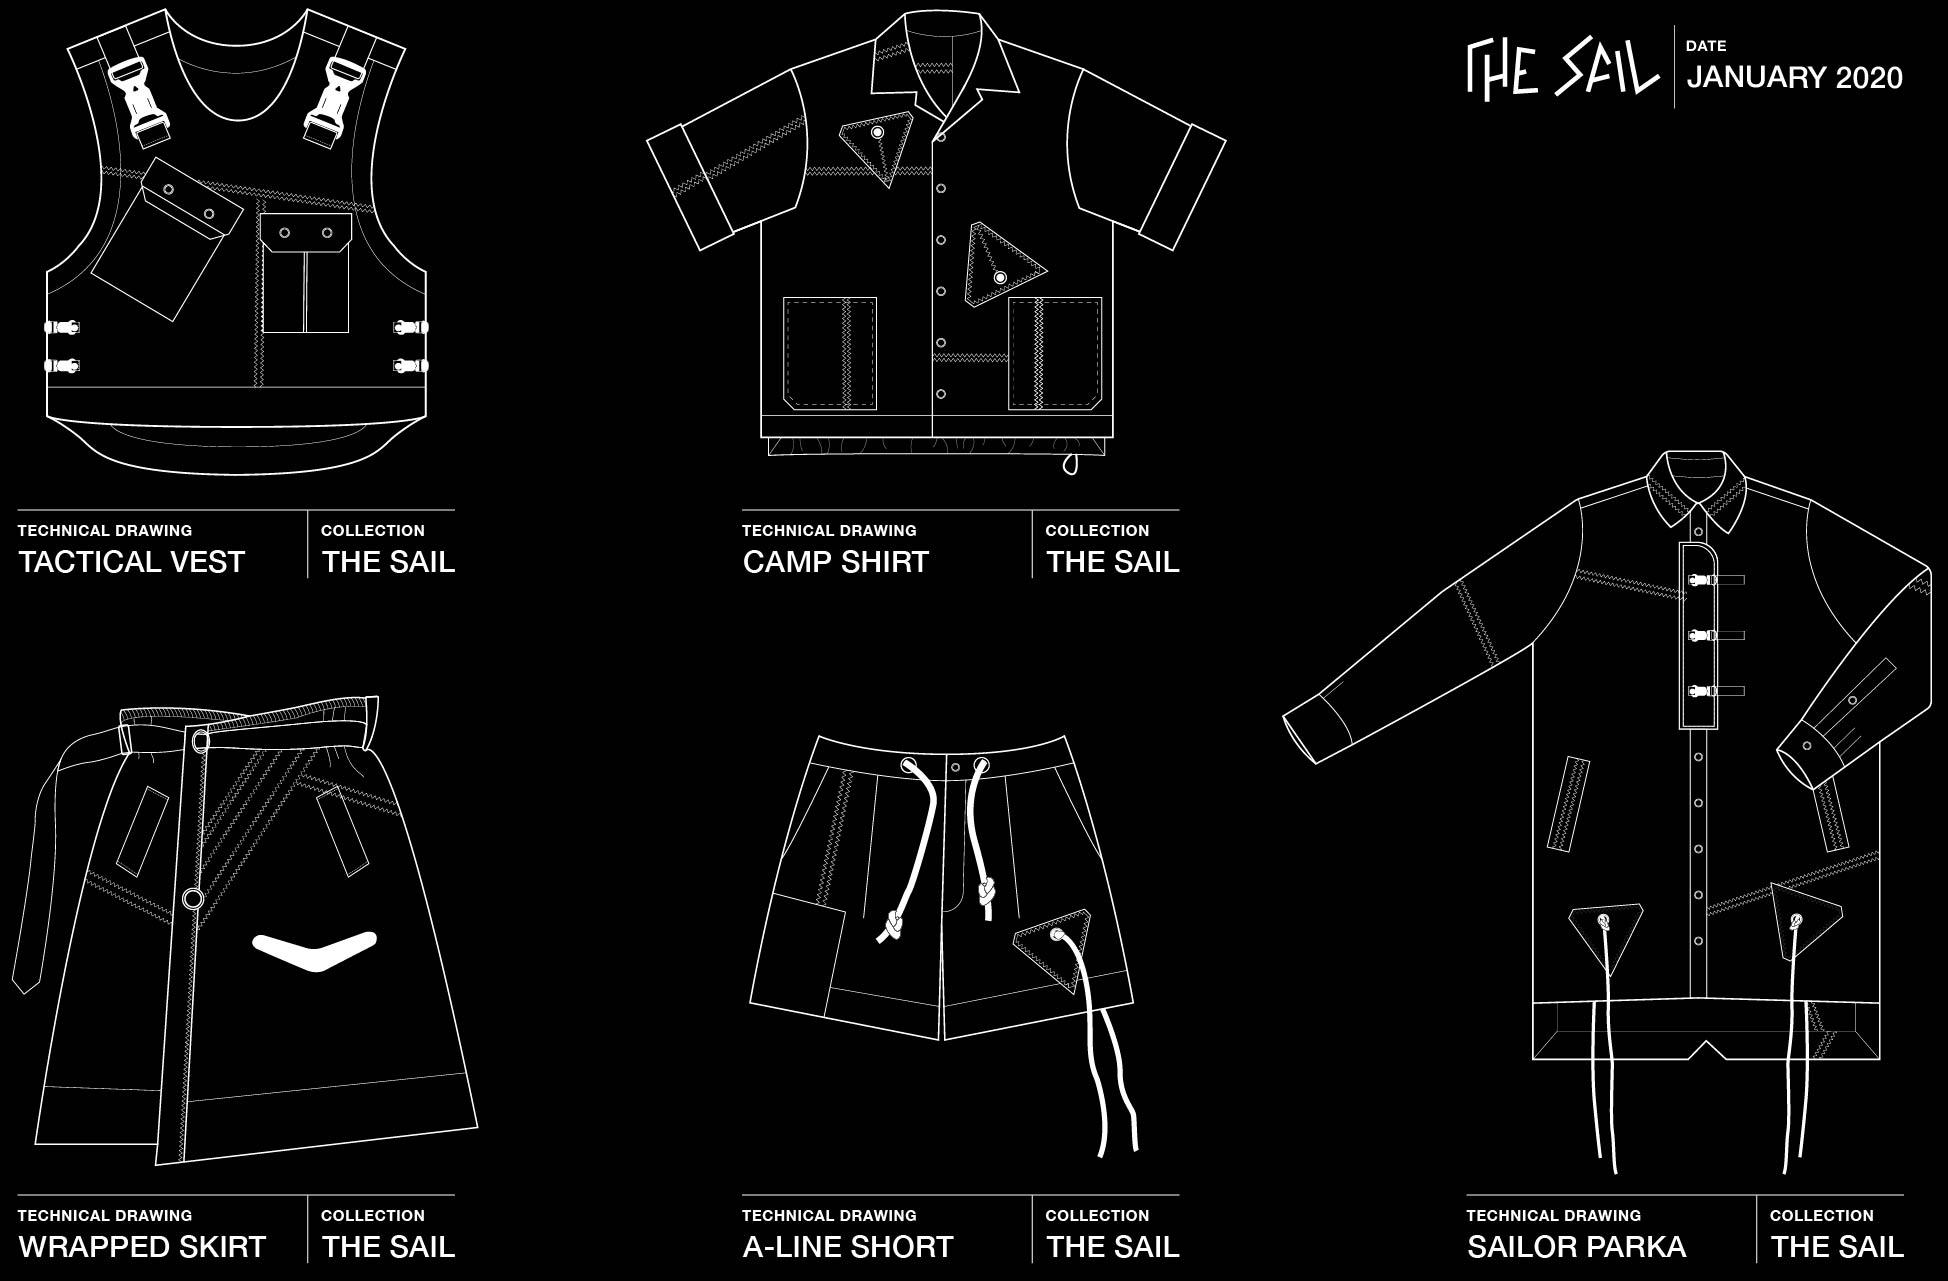 Fashion drafts by Perimetre a creative studio based in Paris